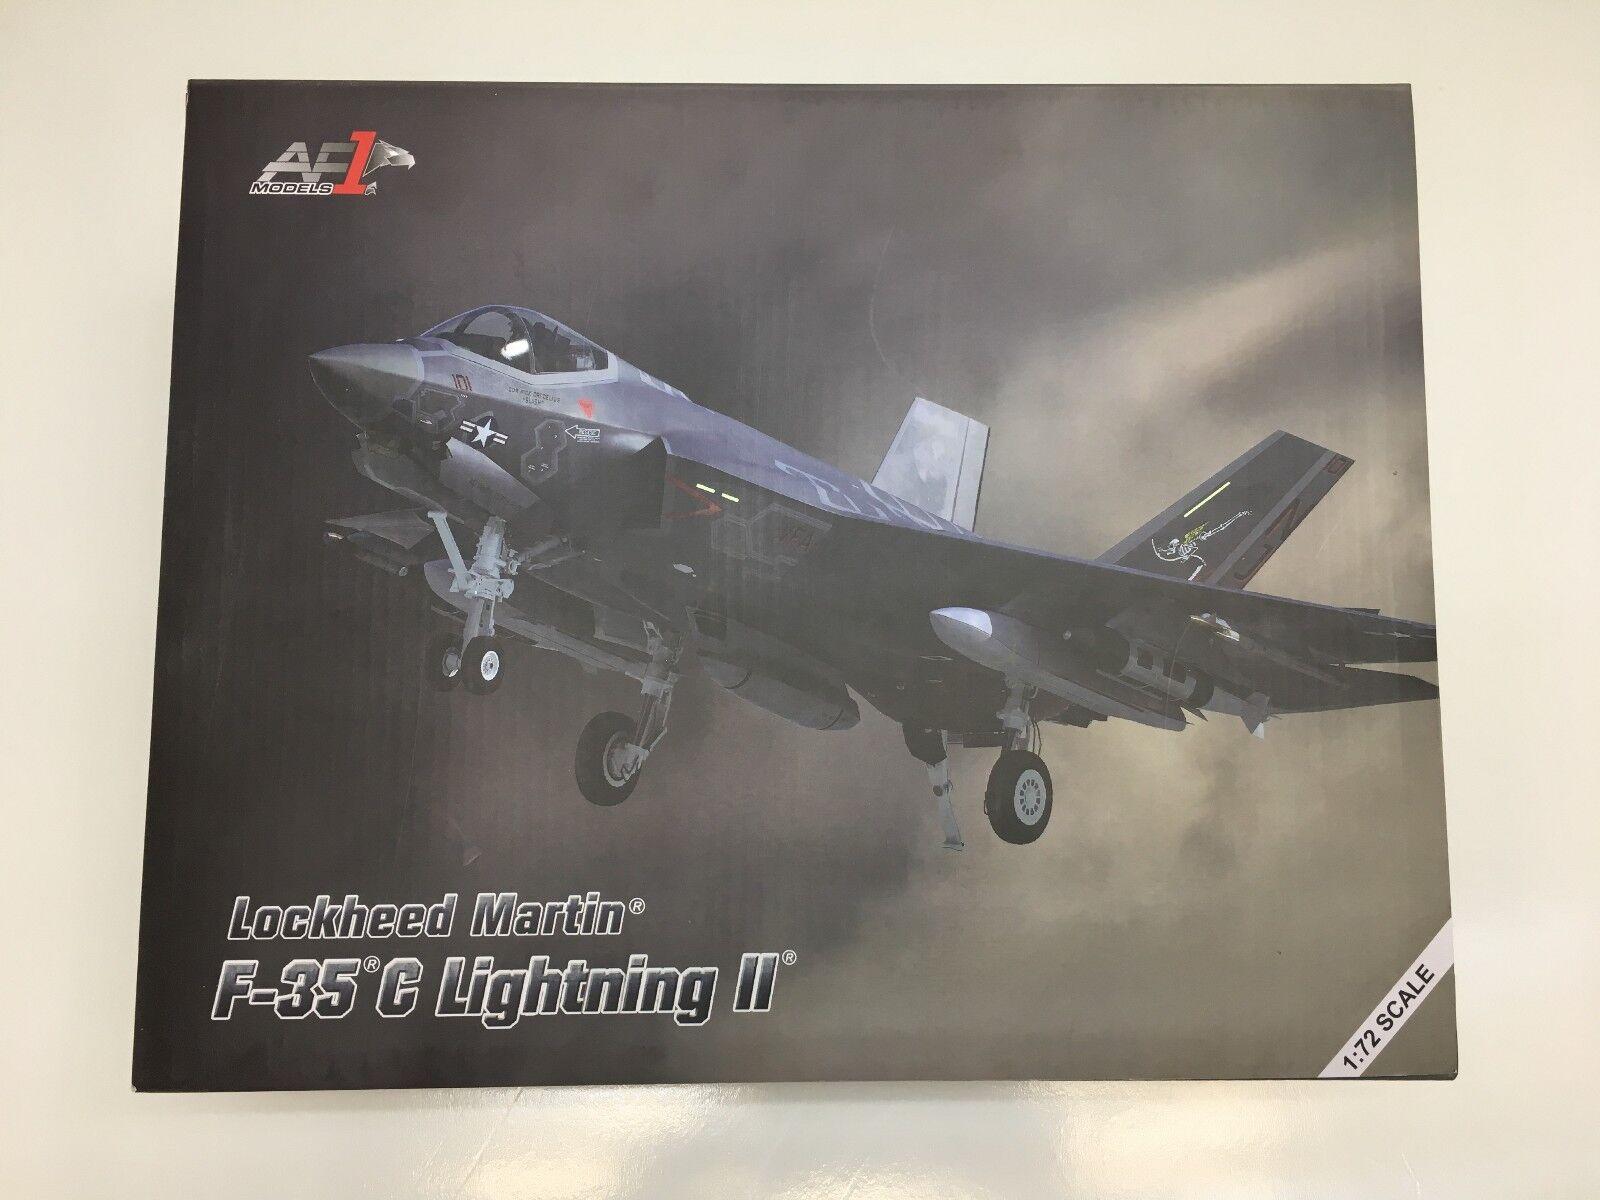 los nuevos estilos calientes Air Force 1 AF1-0010A, Lockheed Martin F-35C Lightning Ii, 1 1 1 72  n ° 1 en línea